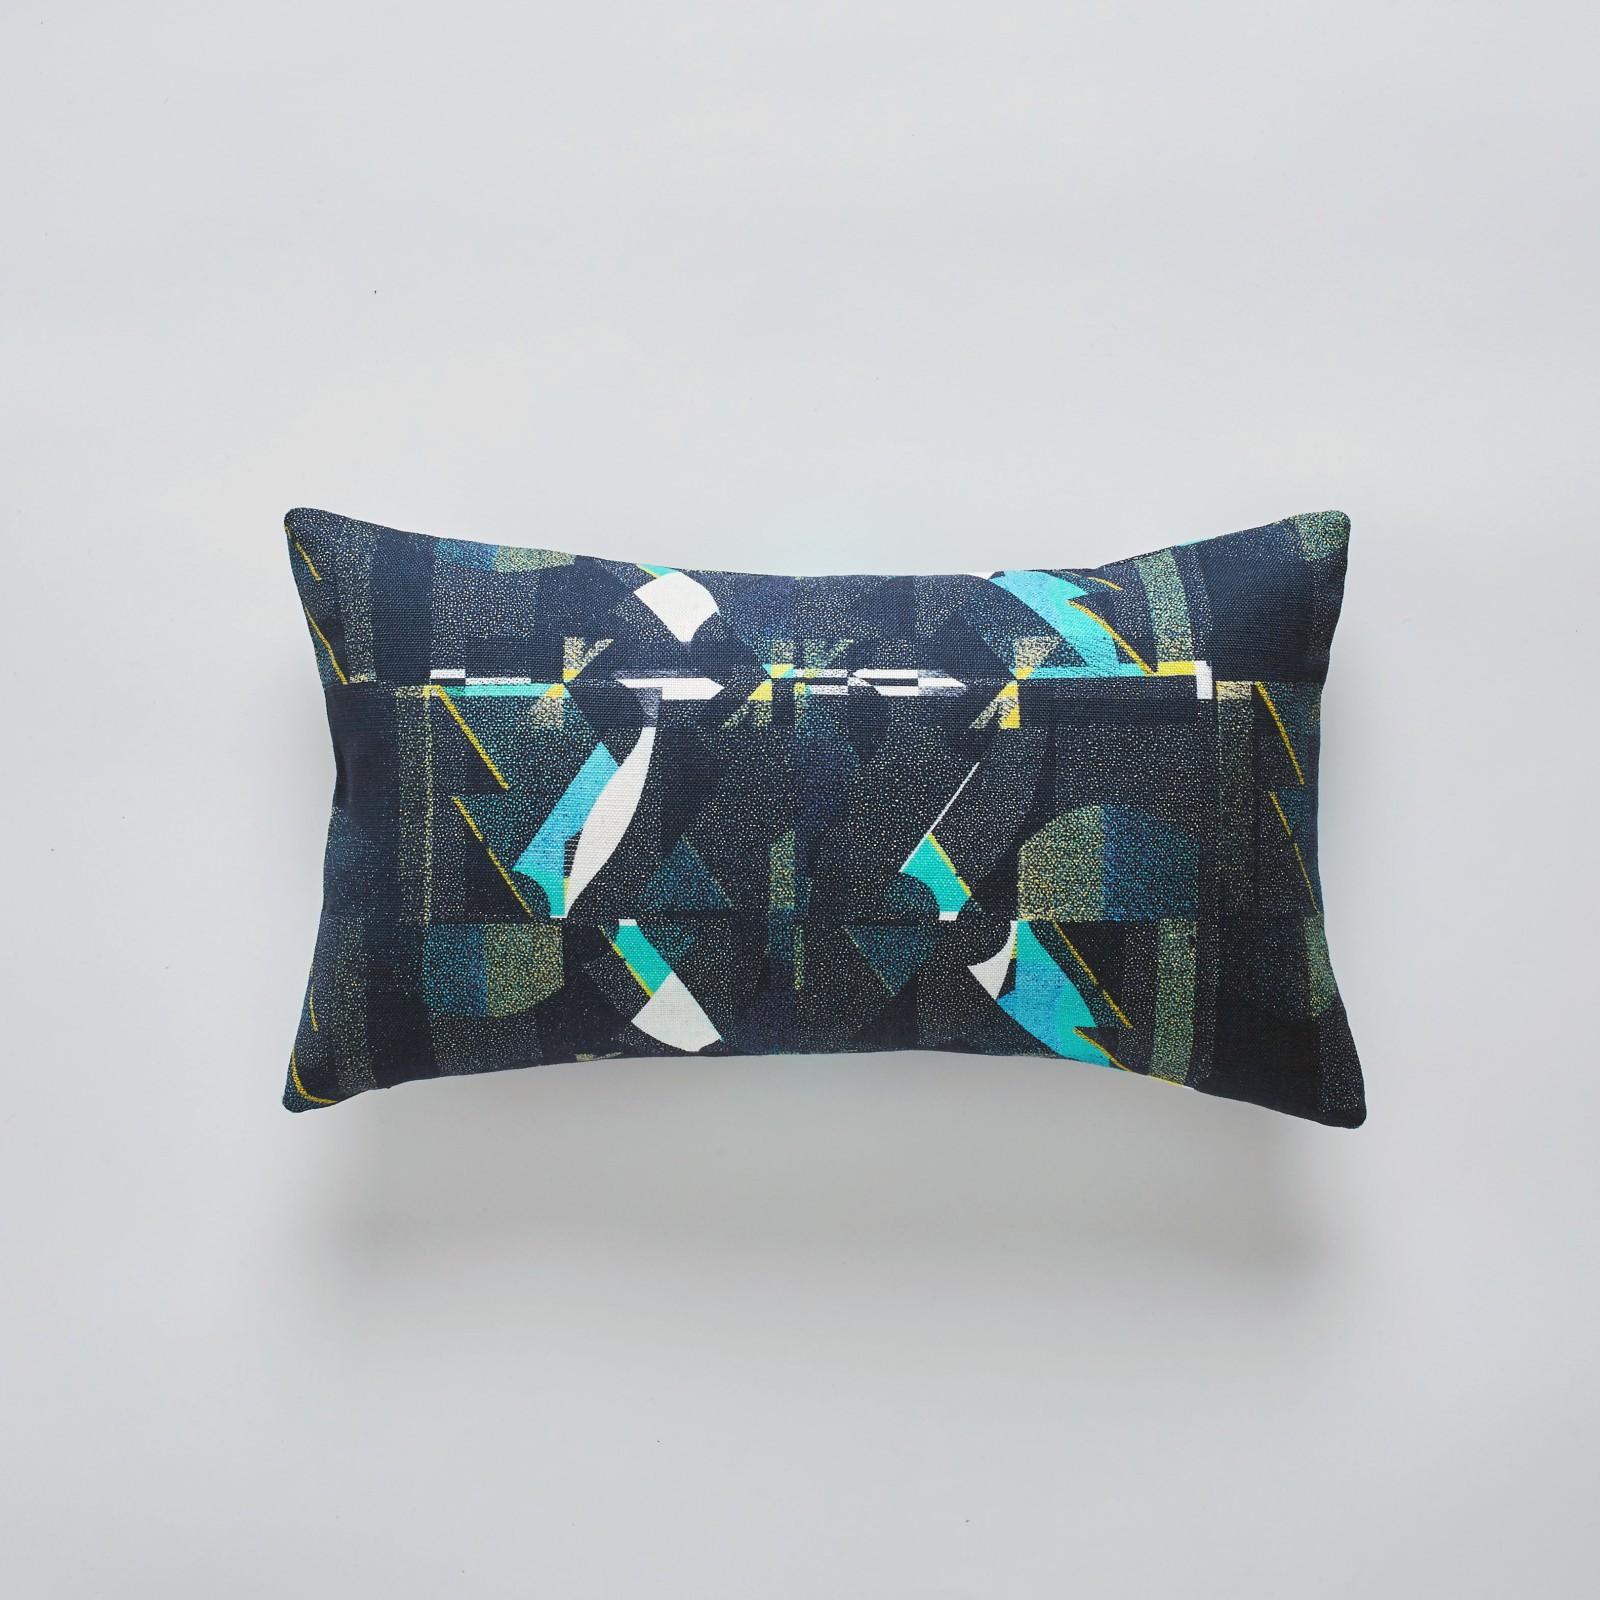 A Shingle Night cushion 30x50cm